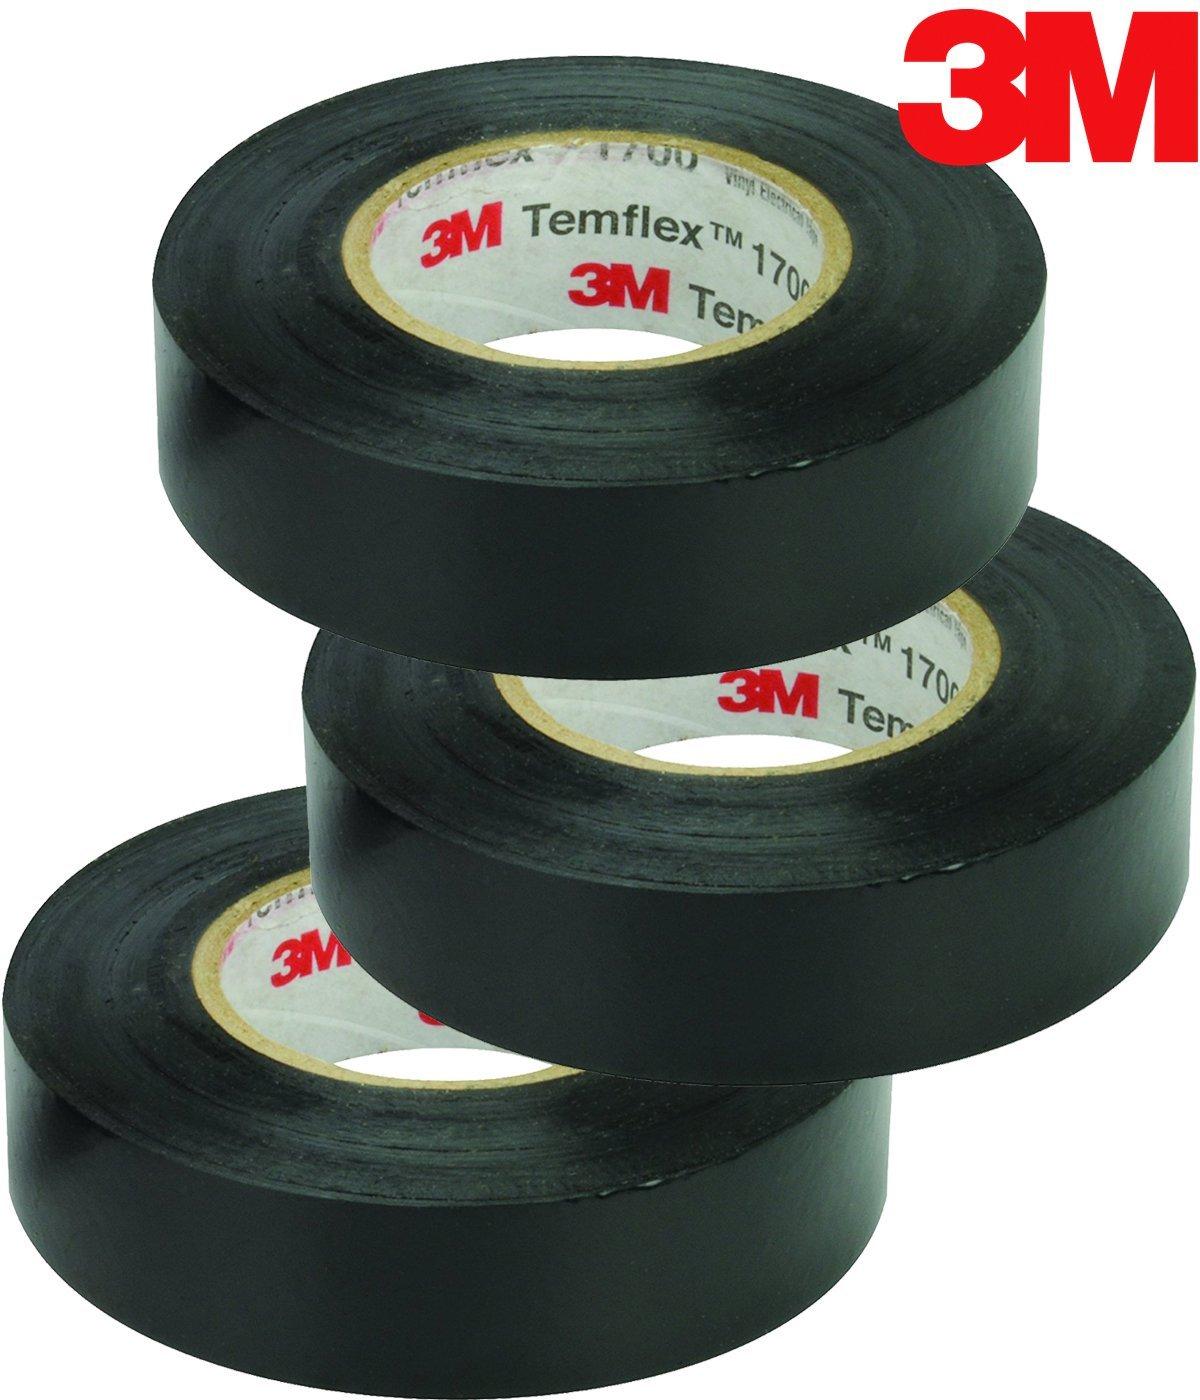 "4 Pack 3M 1700-3//4X60FT-1.5CORE 3//4/"" X 60/' 1.5 Core Vinyl Tape"